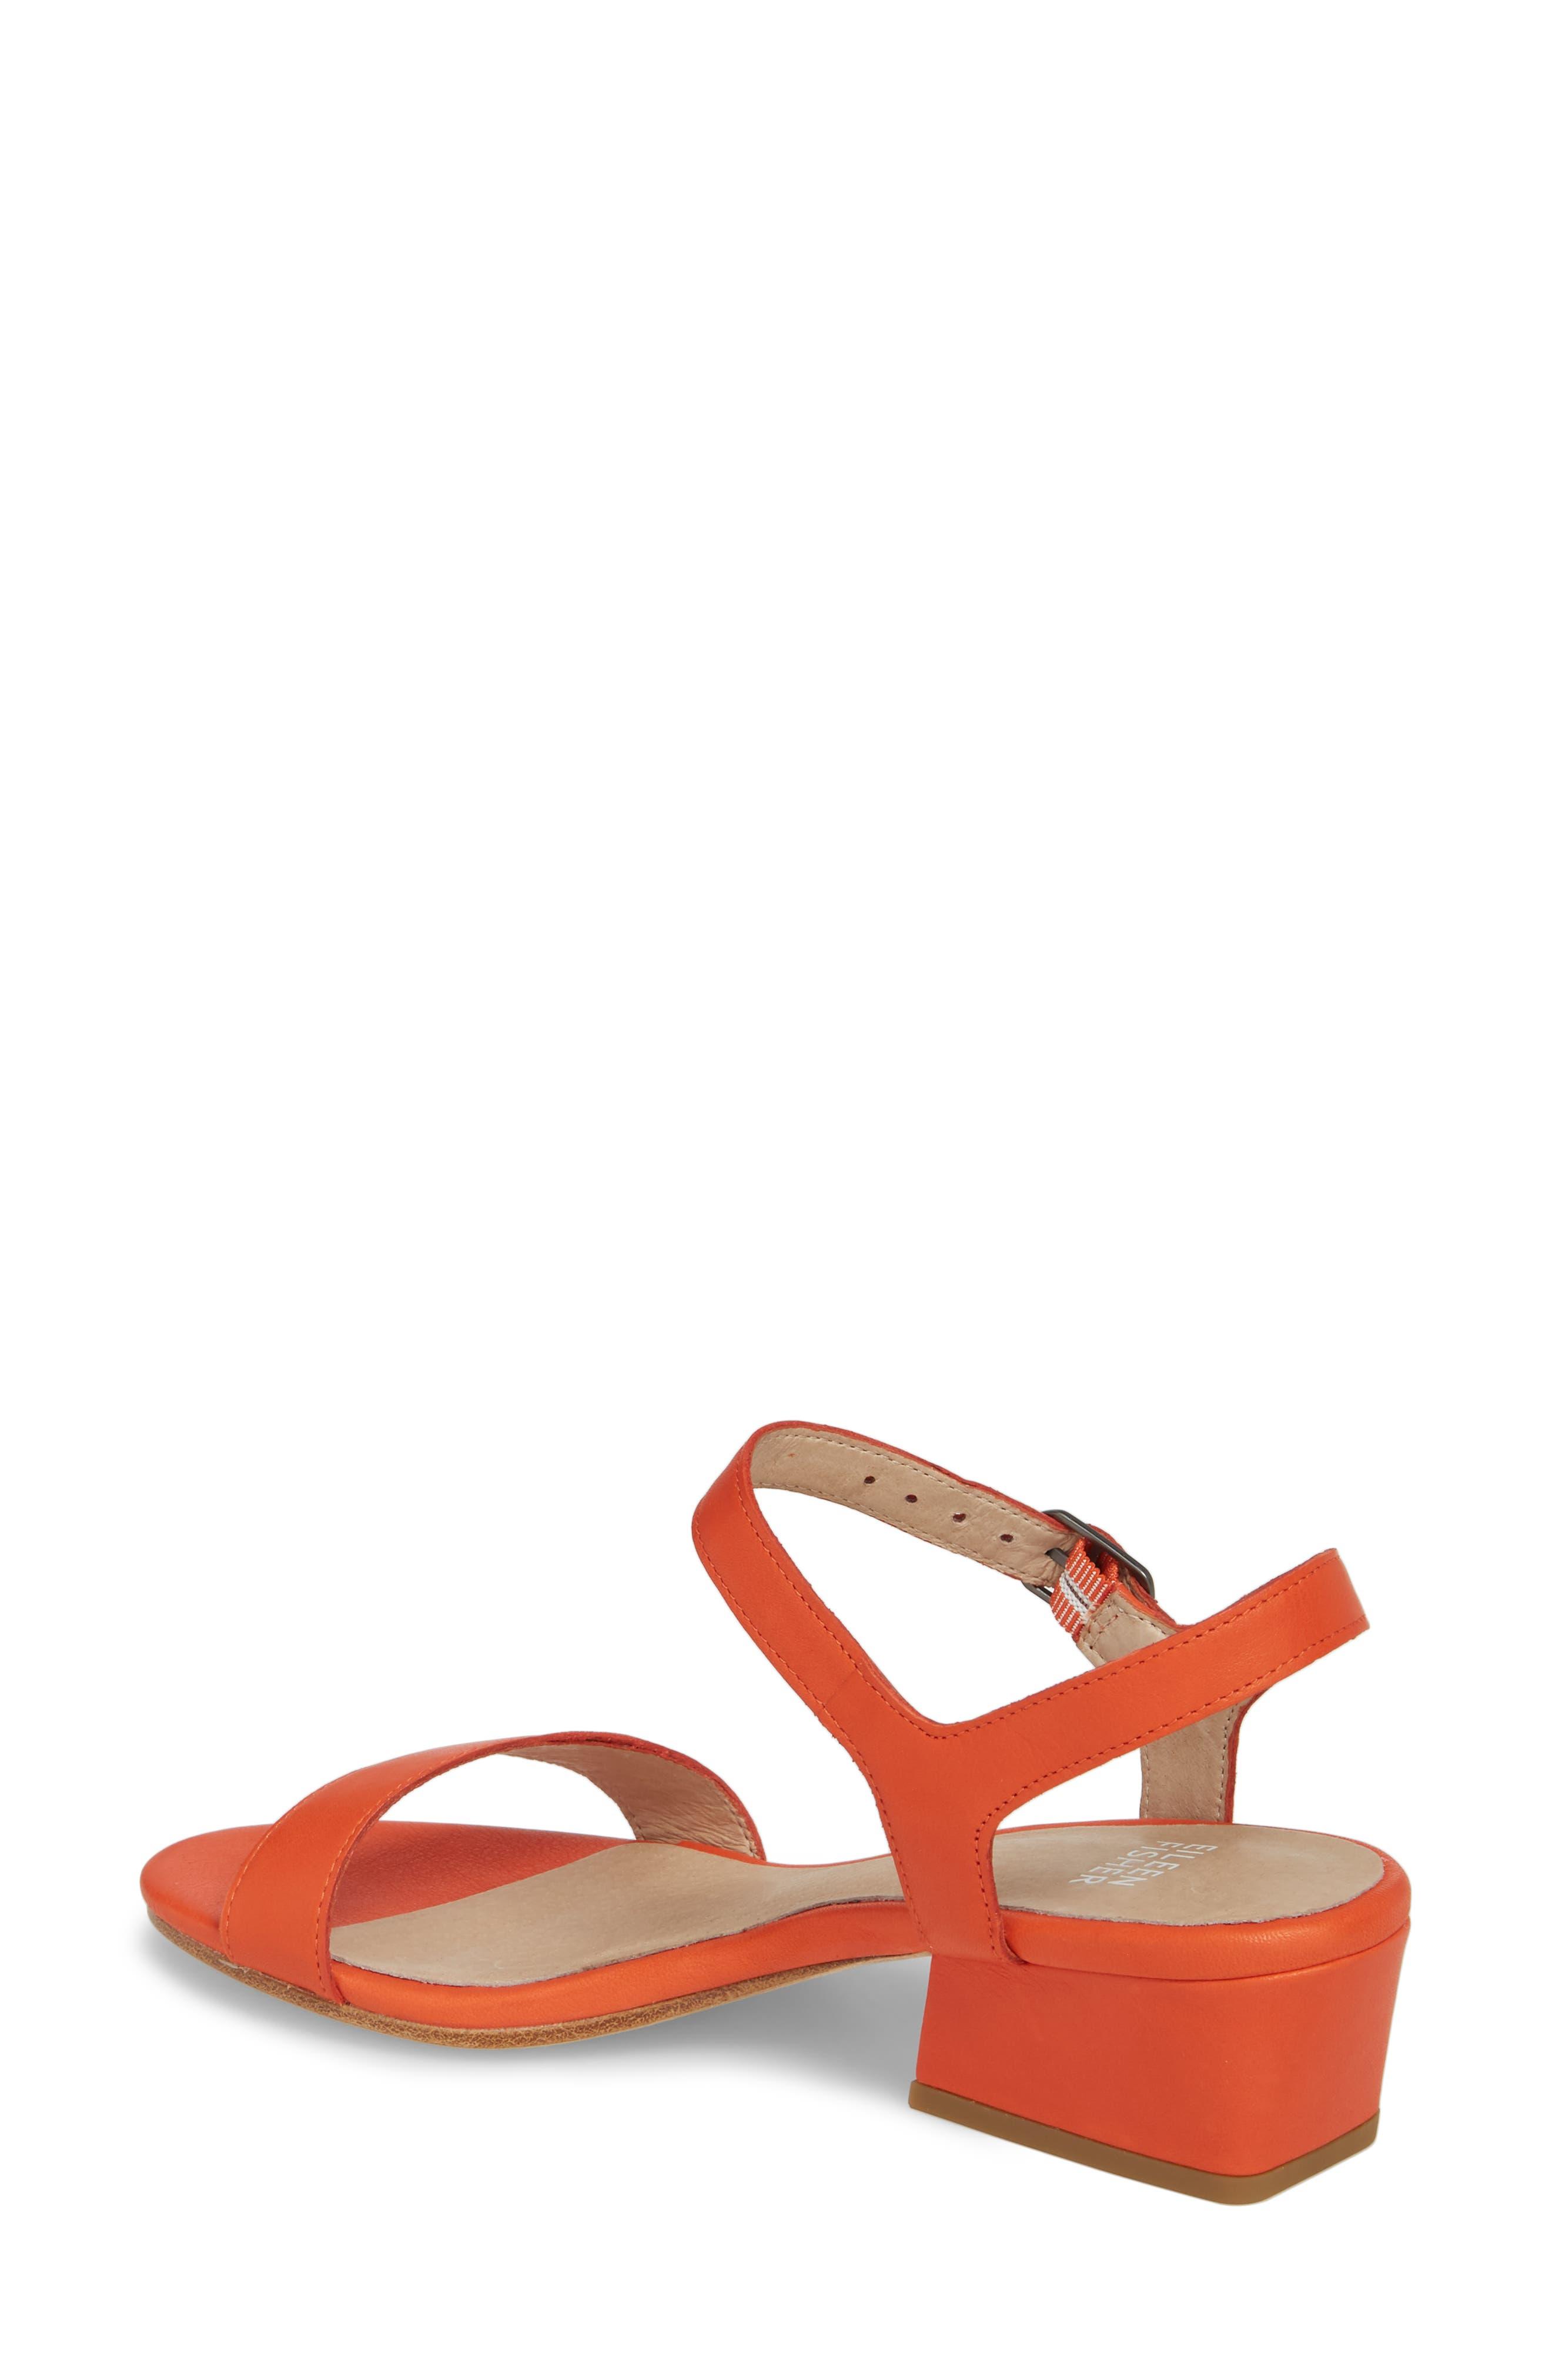 Olean Quarter Strap Sandal,                             Alternate thumbnail 2, color,                             800